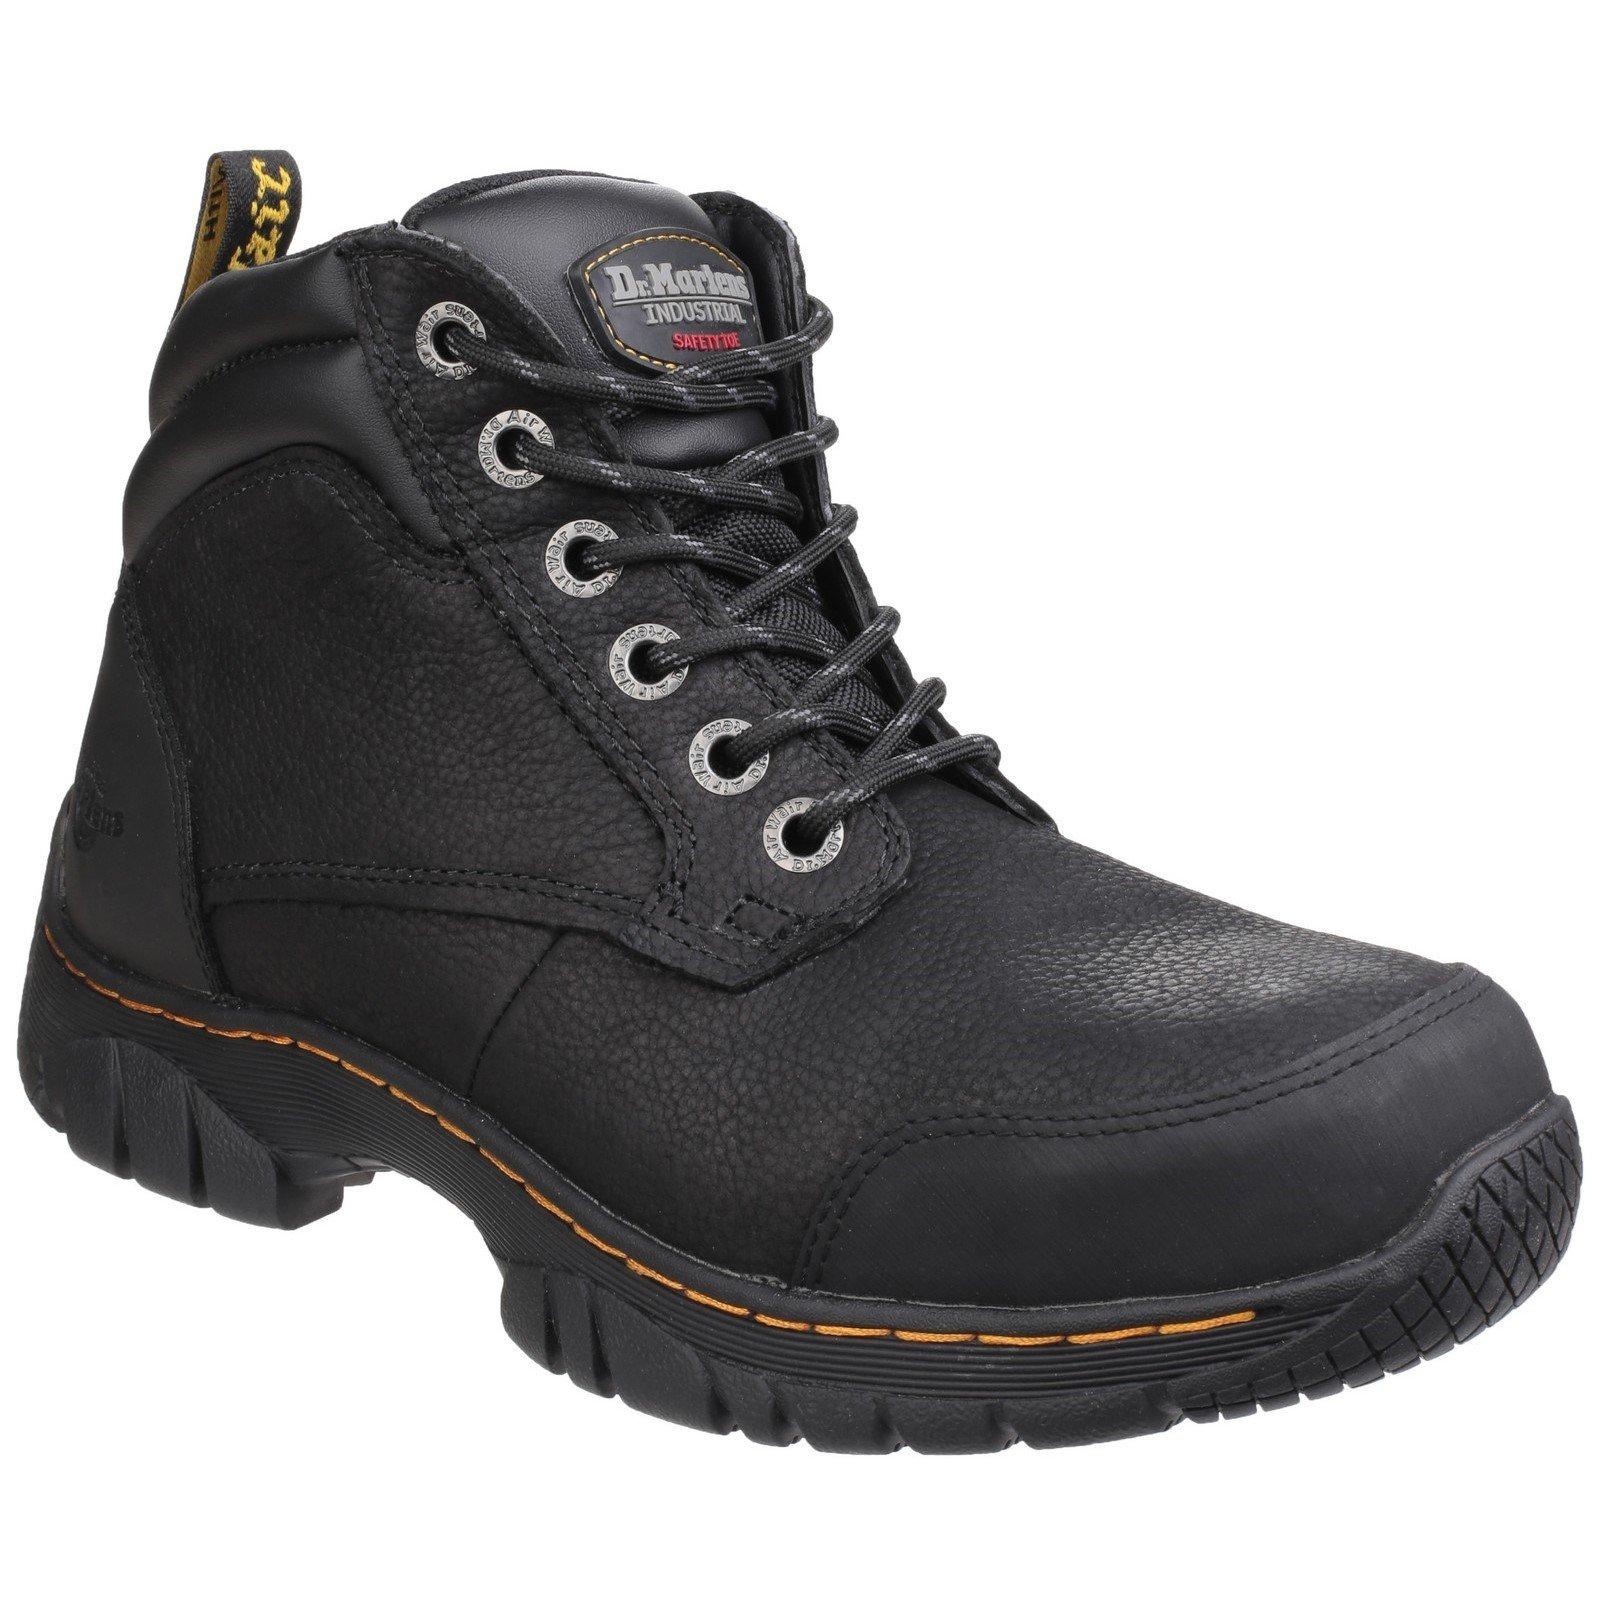 Dr Martens Unisex Riverton SB Lace up Hiker Boot Black 24533 - Black 4